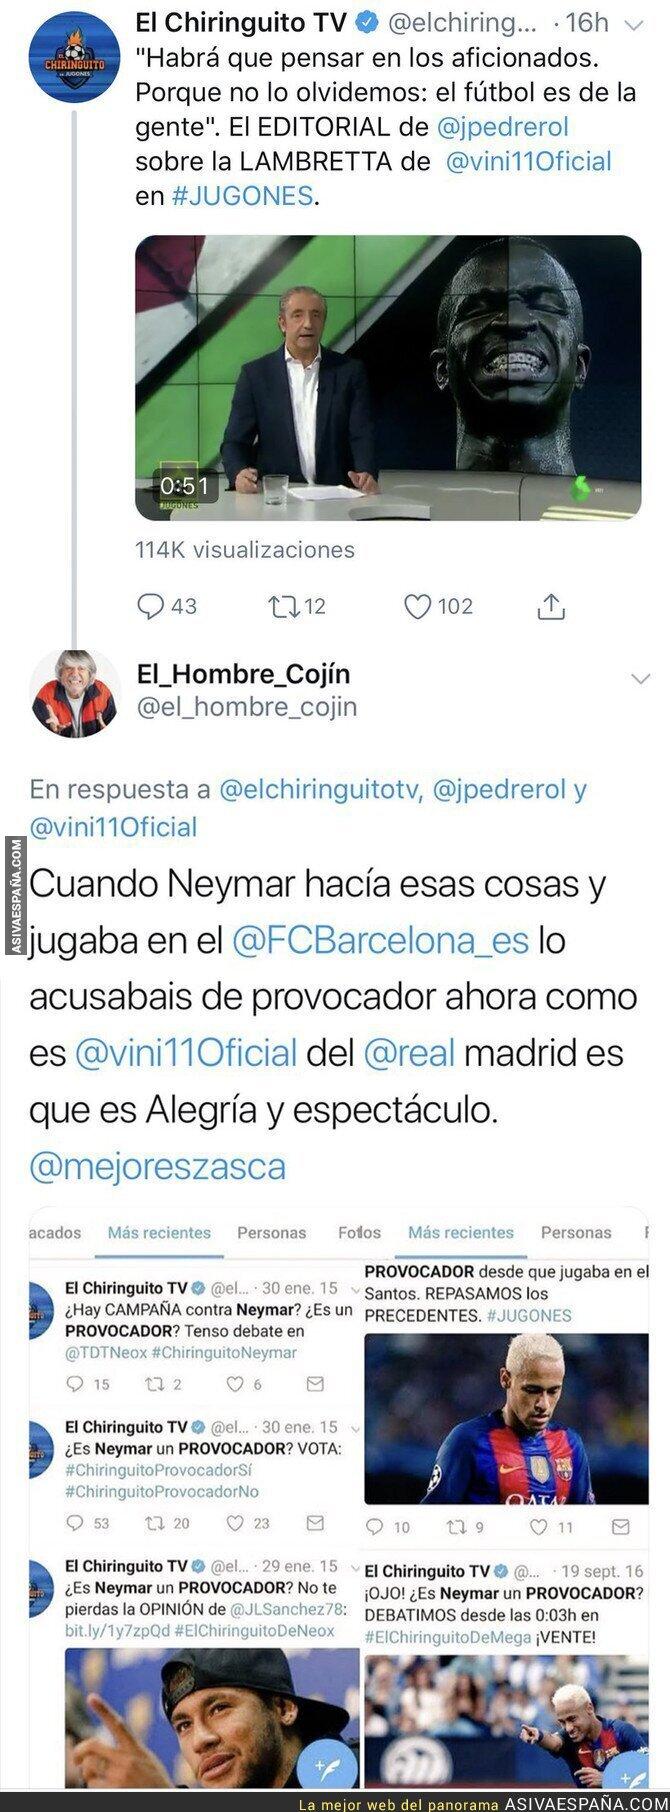 100210 - Este es el nivel de periodismo de Pedrerol depende si habla de un jugador del Madrid o del Barça